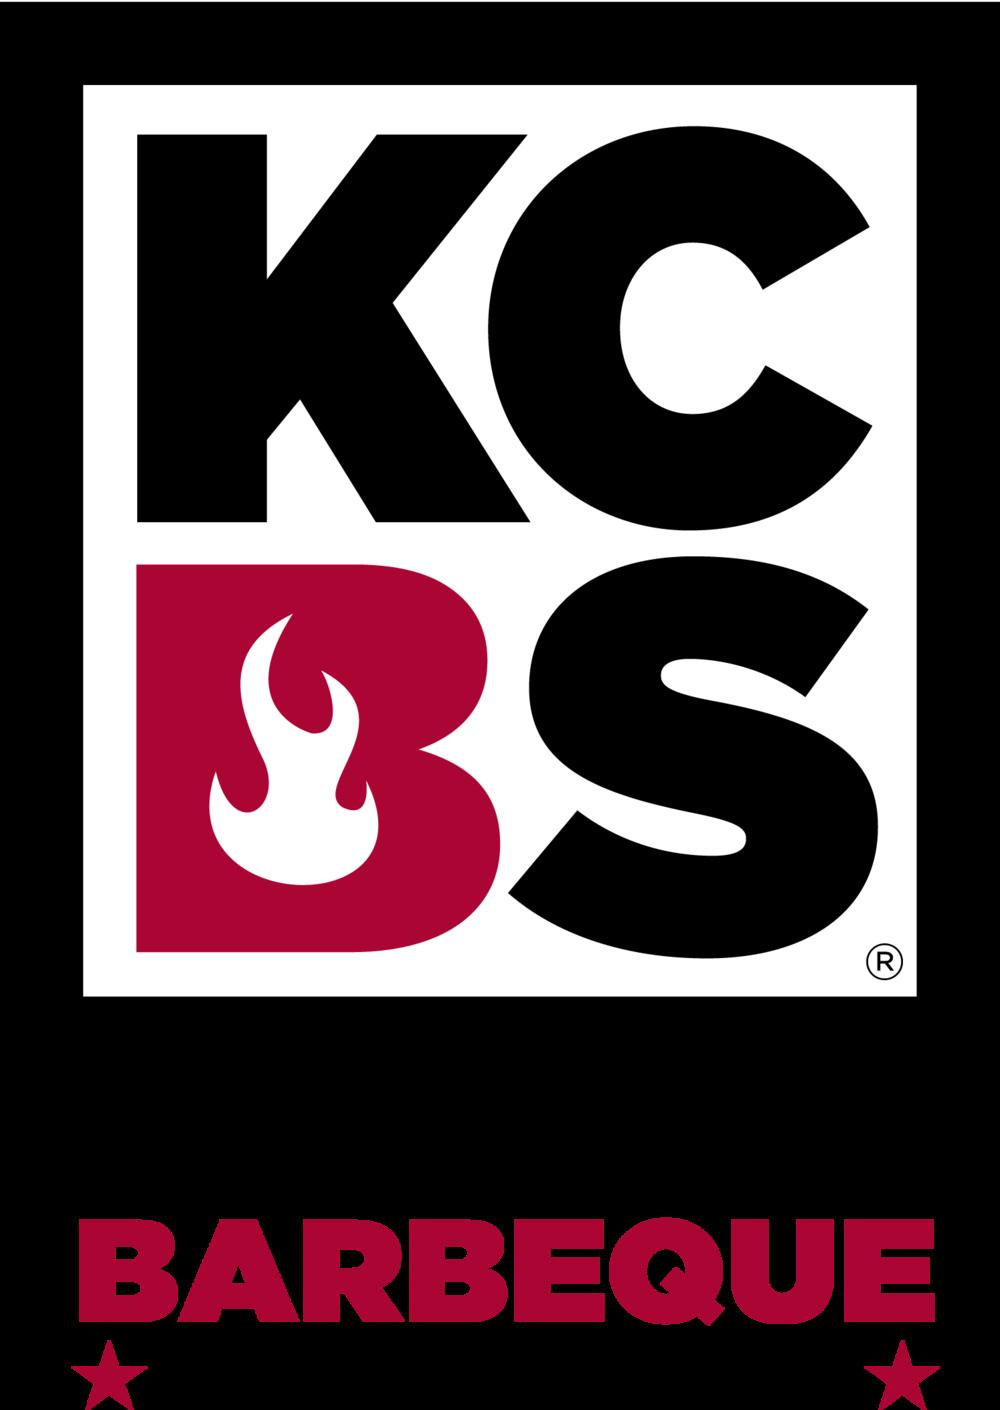 new-kcbs-logo.jpg